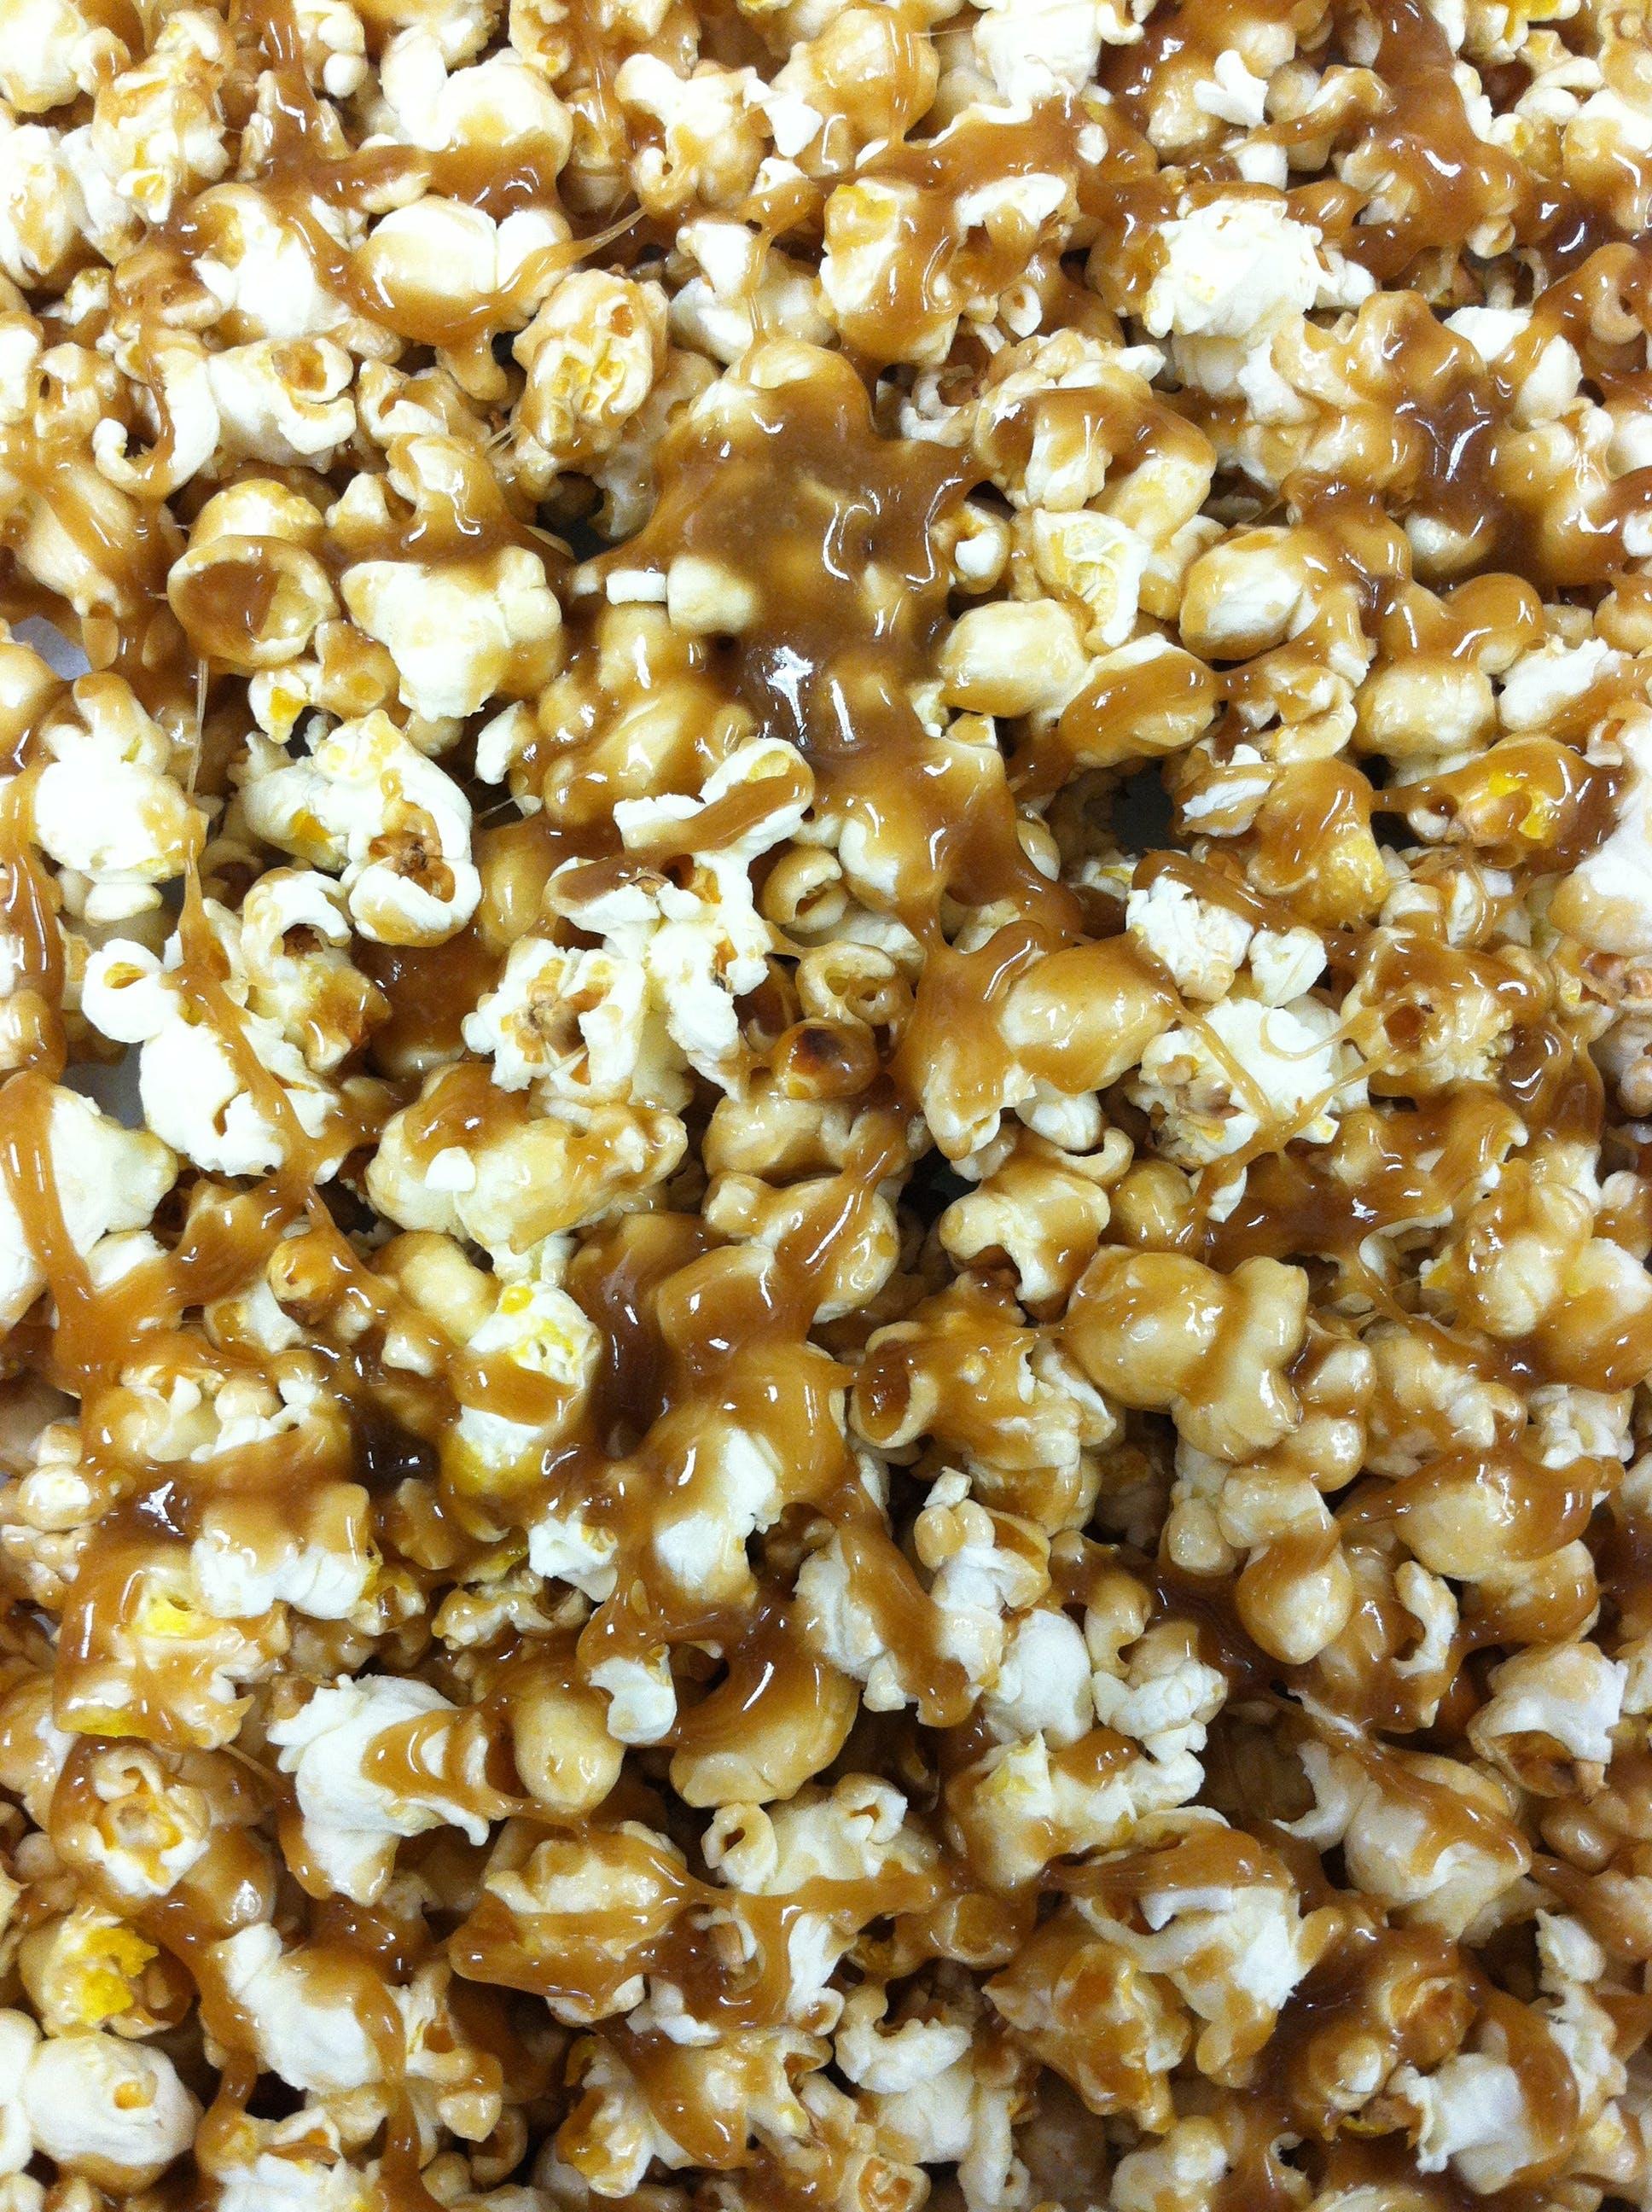 Free stock photo of Carmel corn